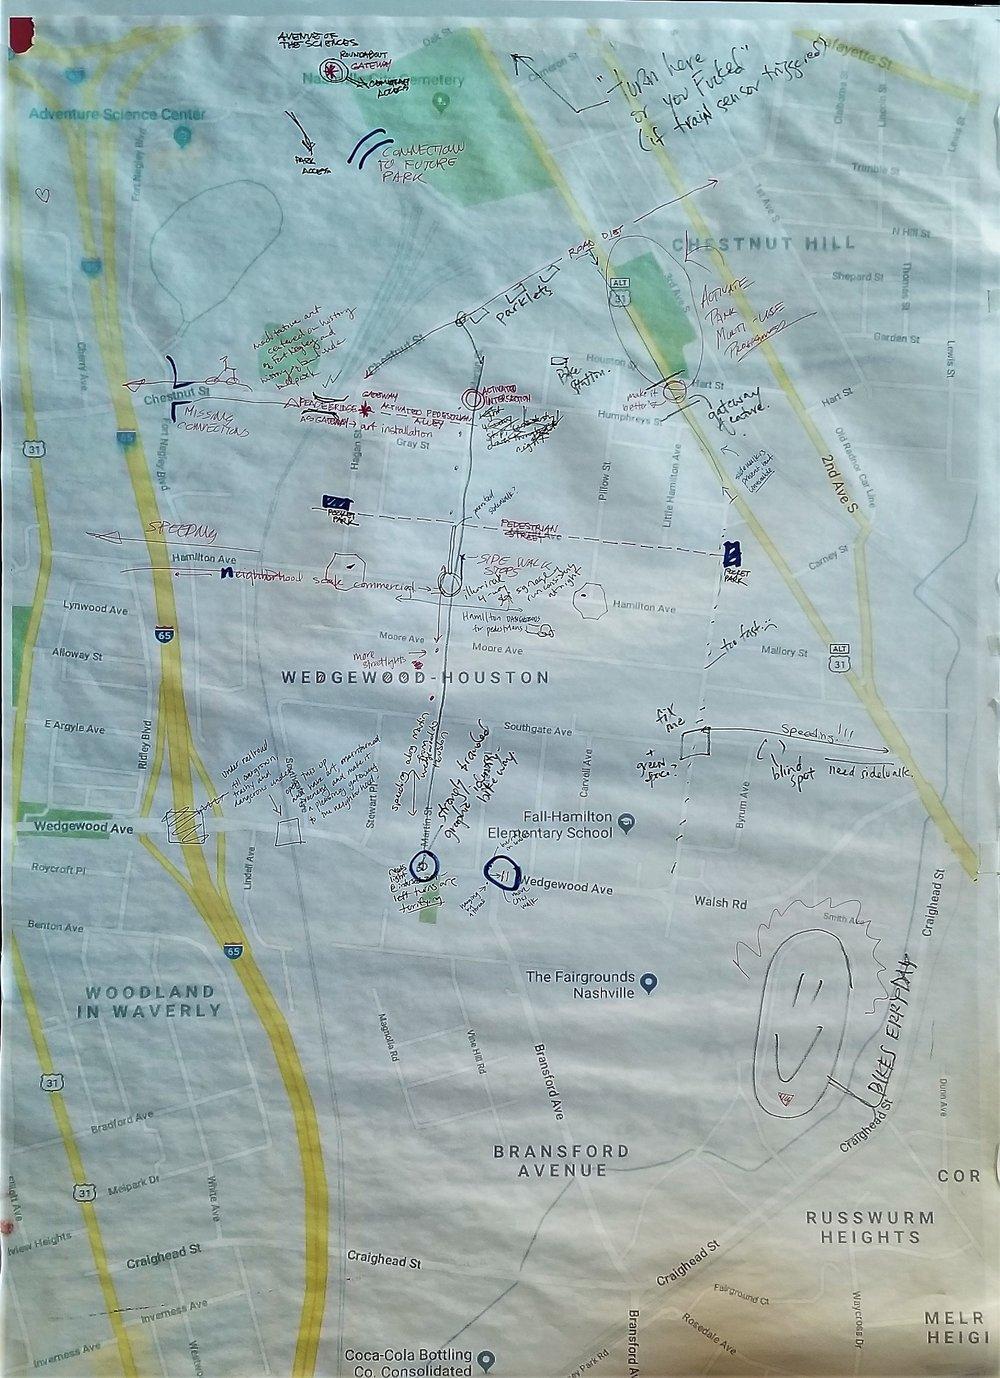 Map of Wedgewood-Houston community feedback